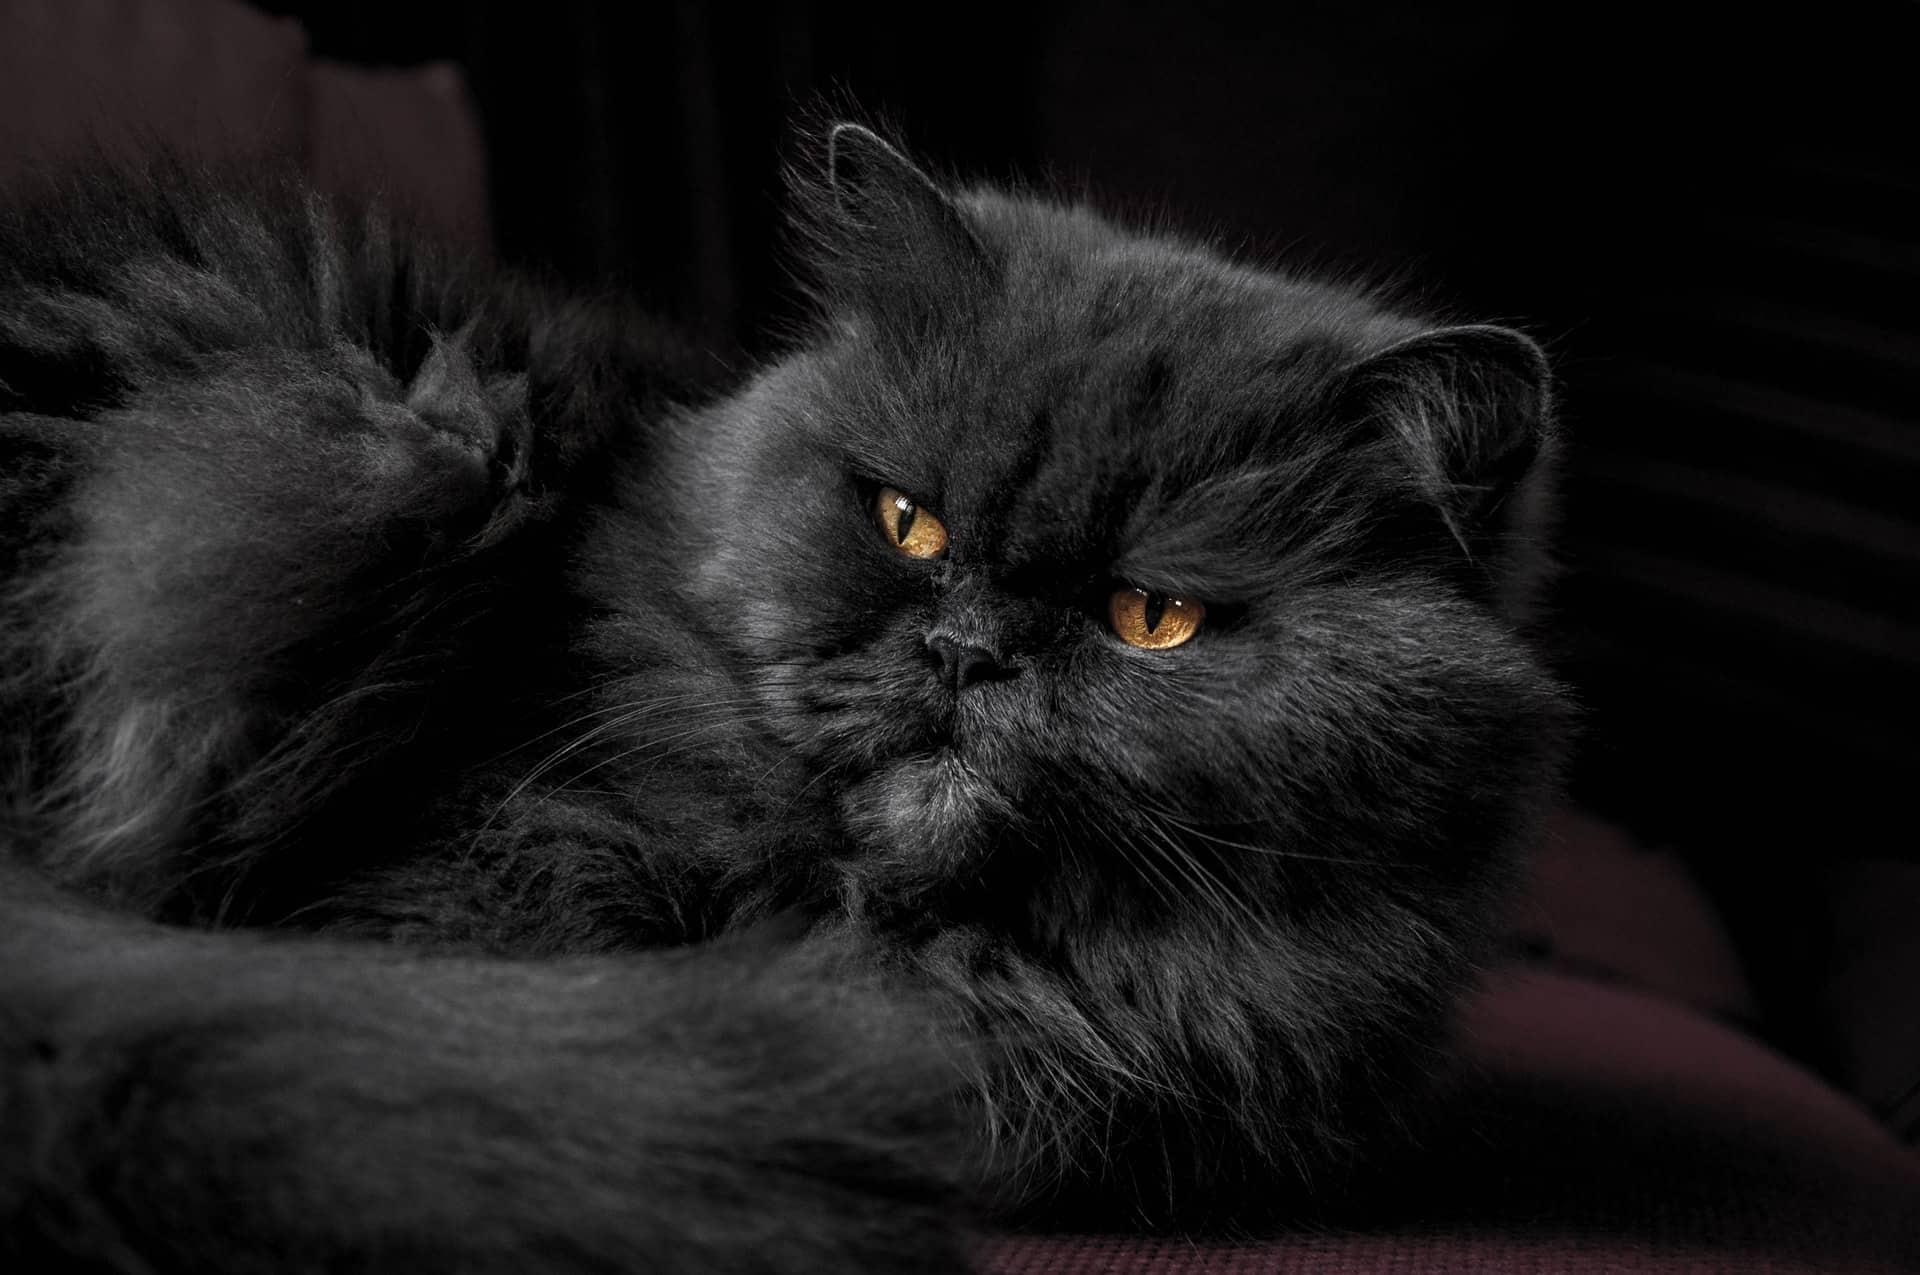 Cat Breeds Kids Article Image 7